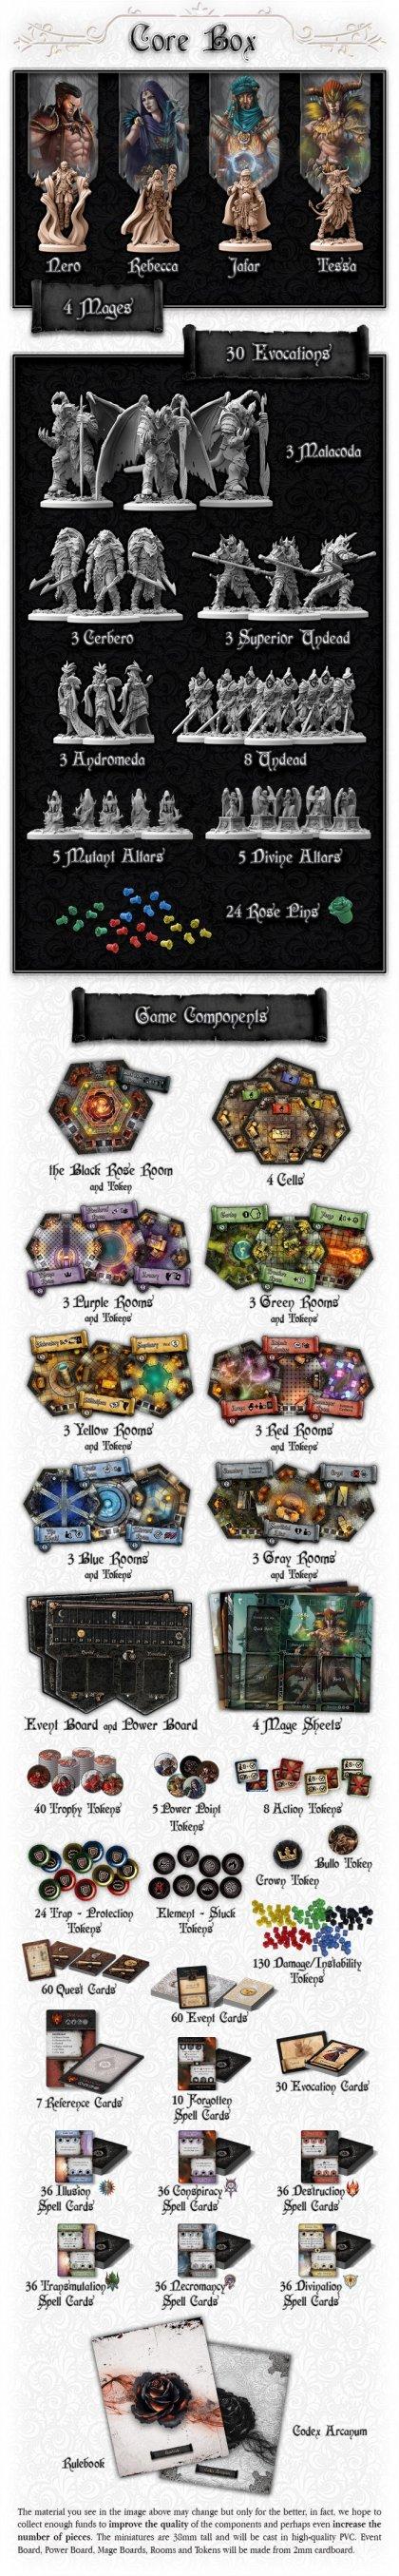 Black Rose Wars: componenti